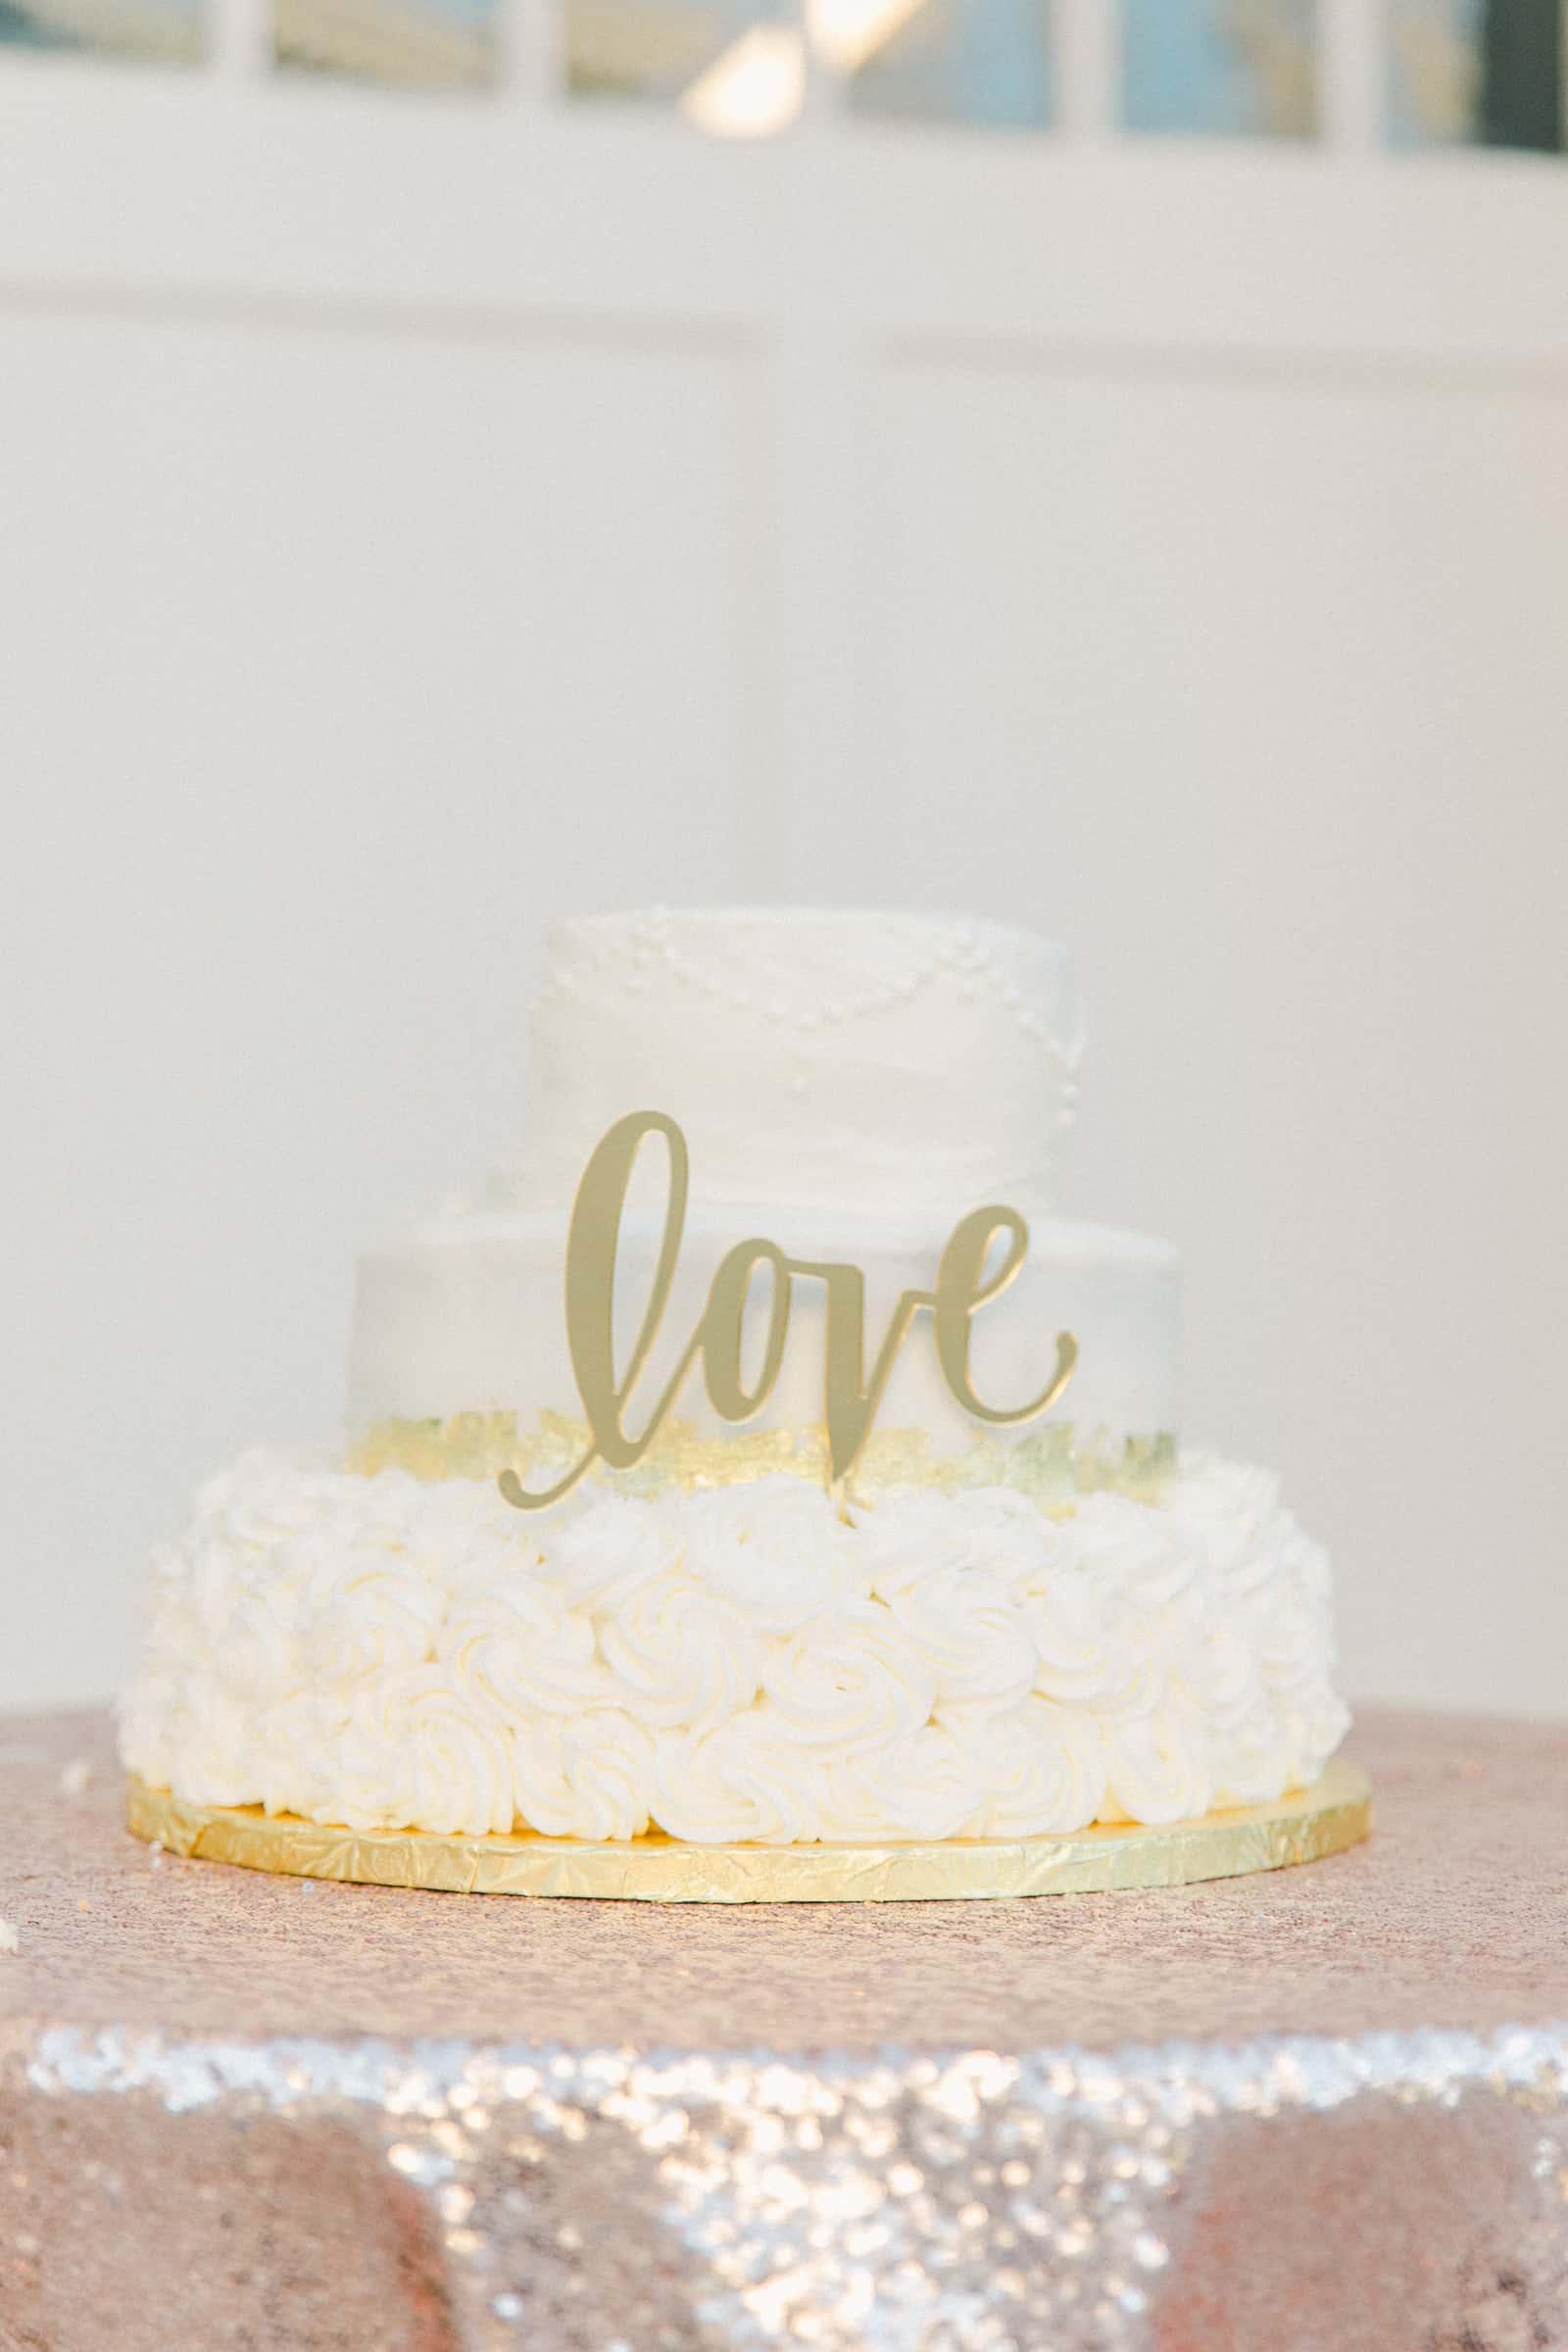 Thomas S. Monson Center Wedding, Salt Lake LDS Temple Wedding, Utah wedding photography, small simple white buttercream wedding cake